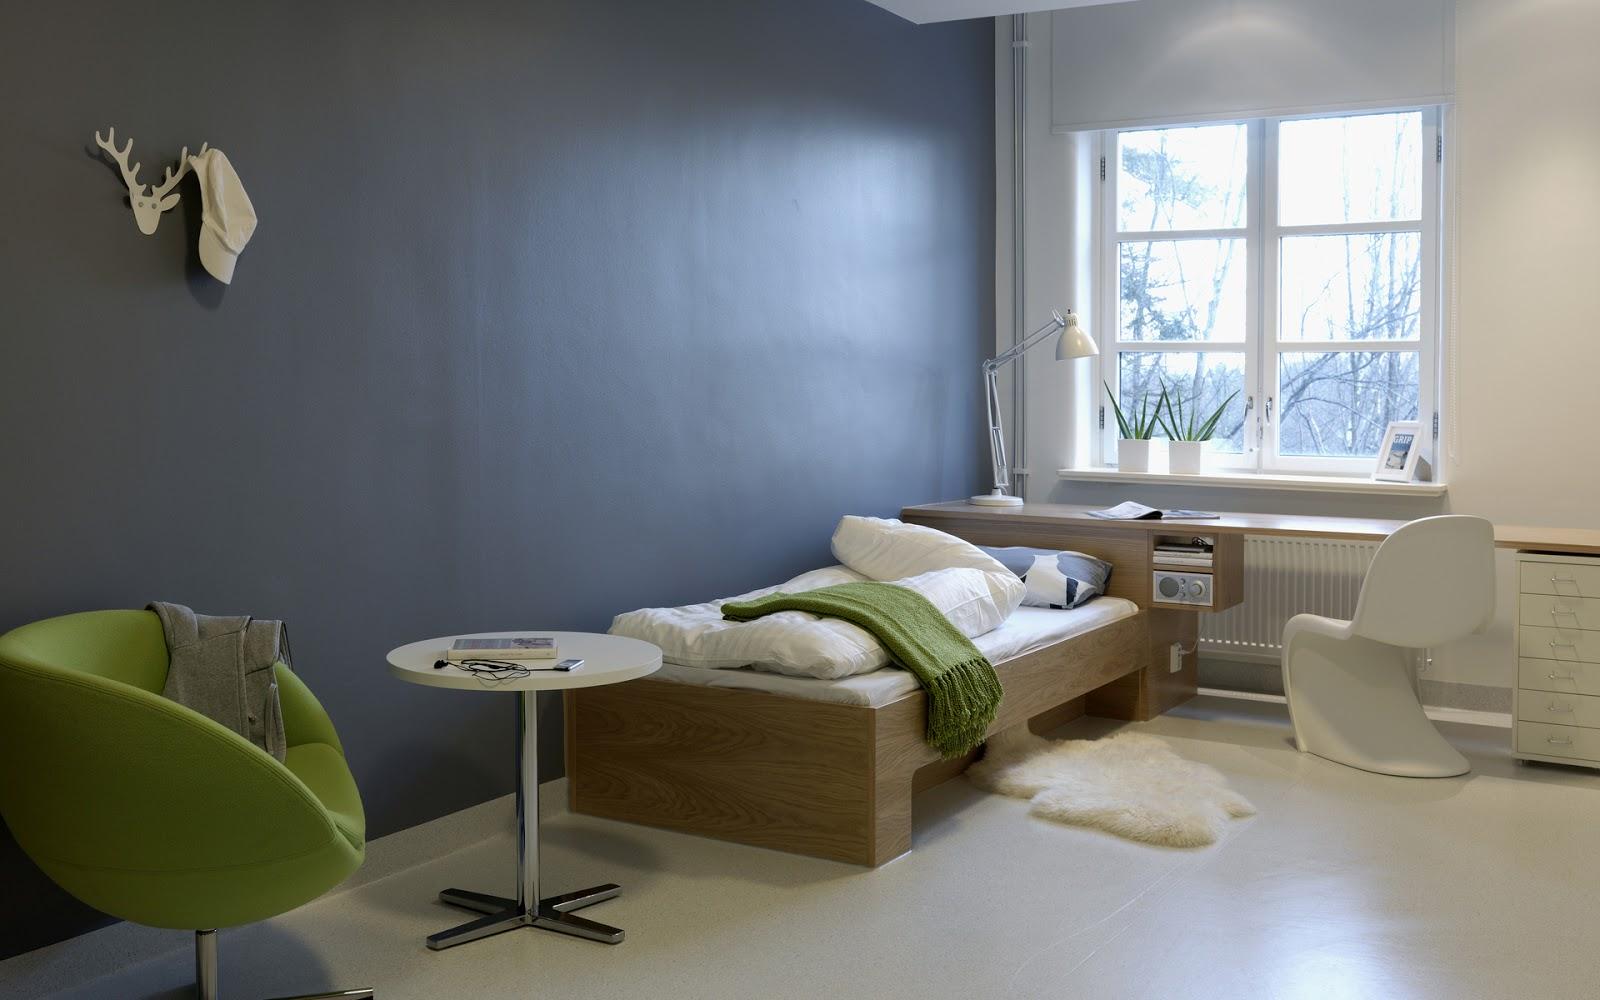 http://3.bp.blogspot.com/-euU1xFuDNBE/UJqP-yzgb5I/AAAAAAAAK20/00q1rU0H2RY/s1600/modern+living+room.jpg